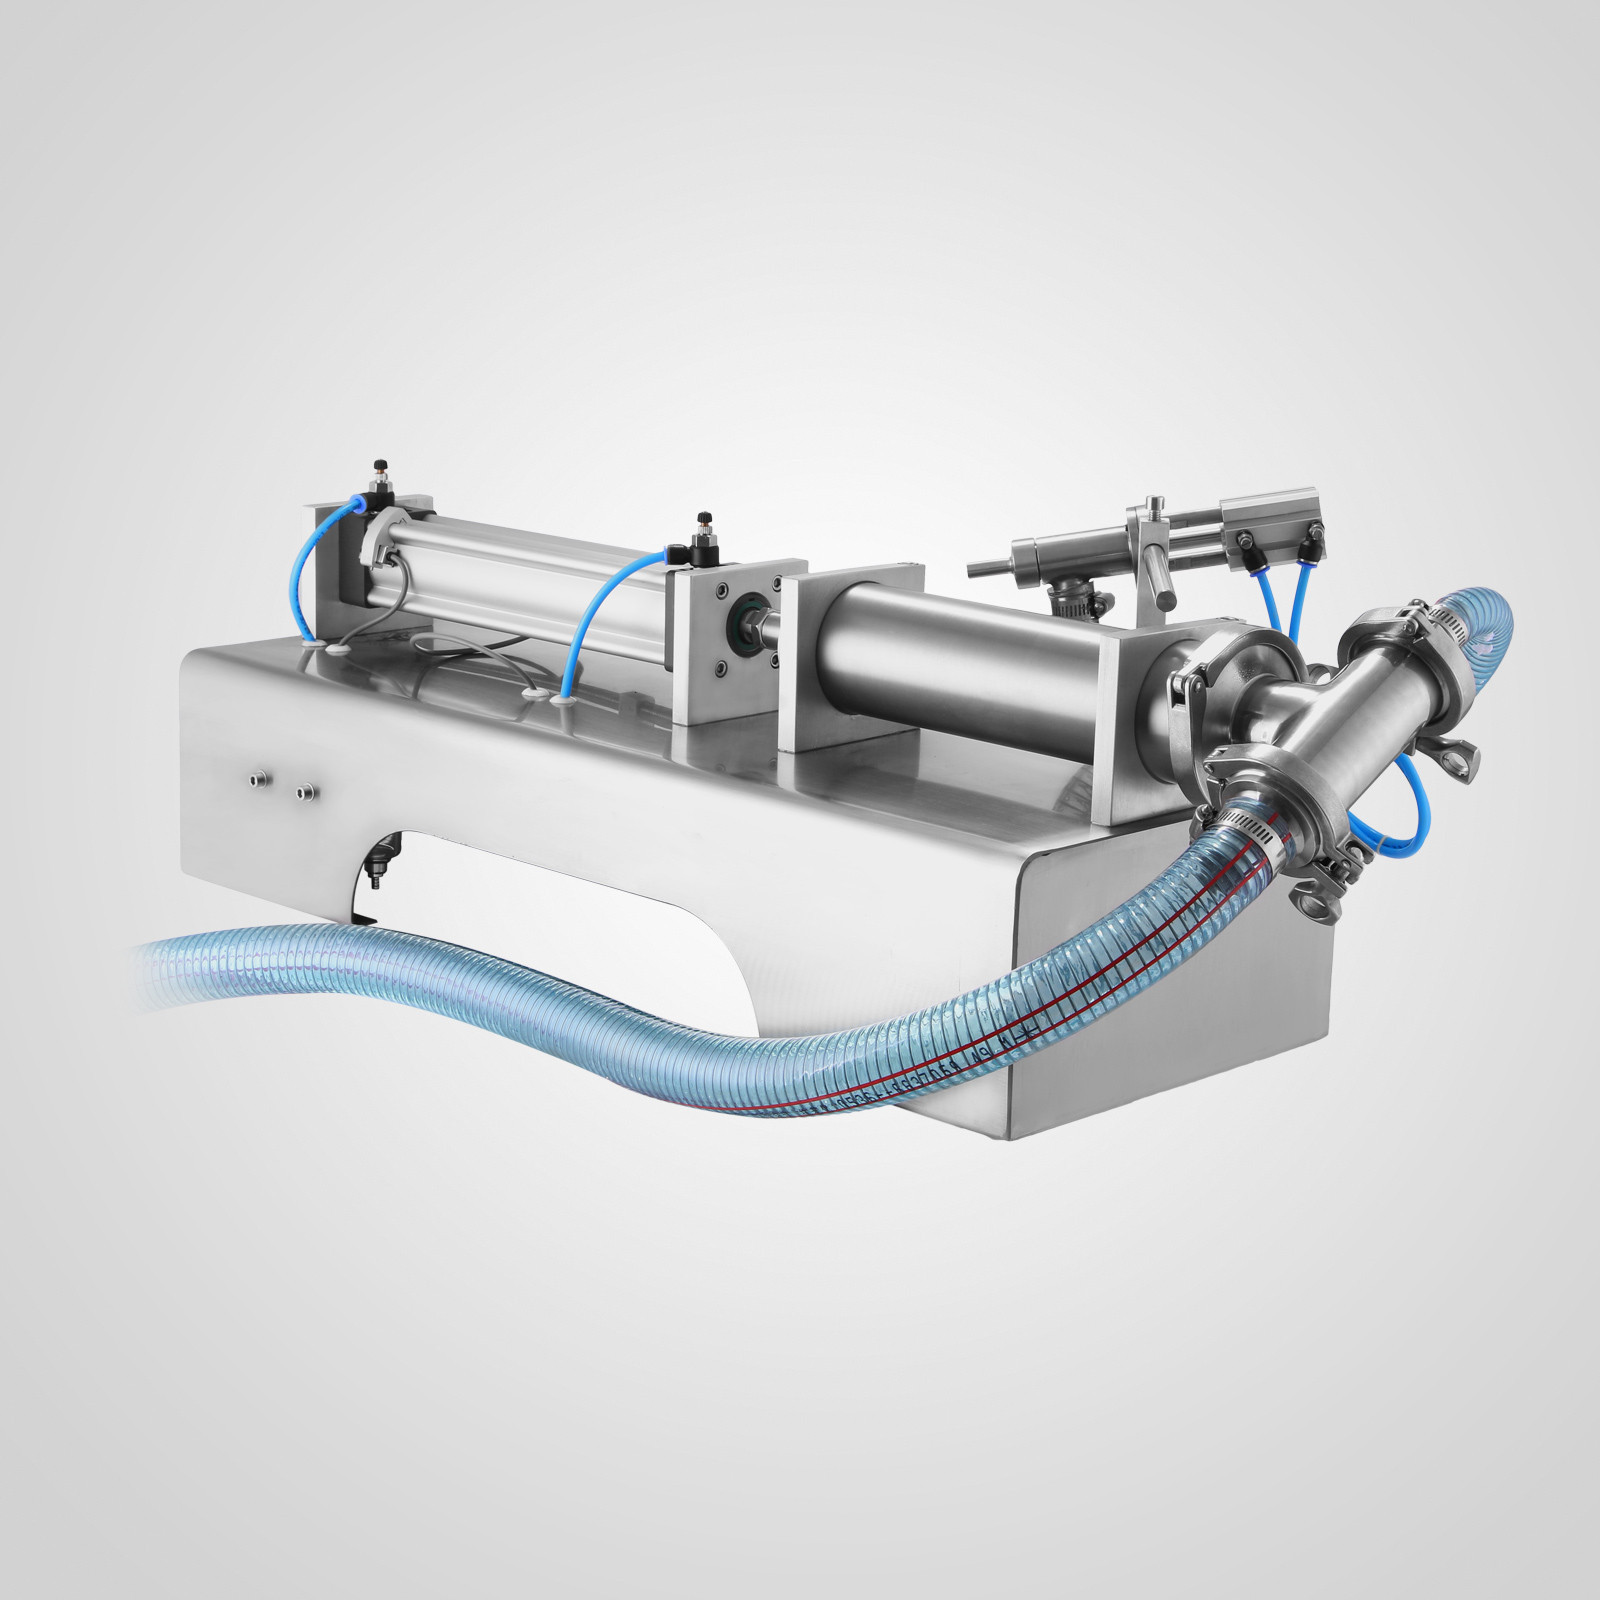 Liquid-Filling-Machine-Filler-Remplissage-2-3500ML-50-500ML-INDUSTRY-SUPPLY miniature 65